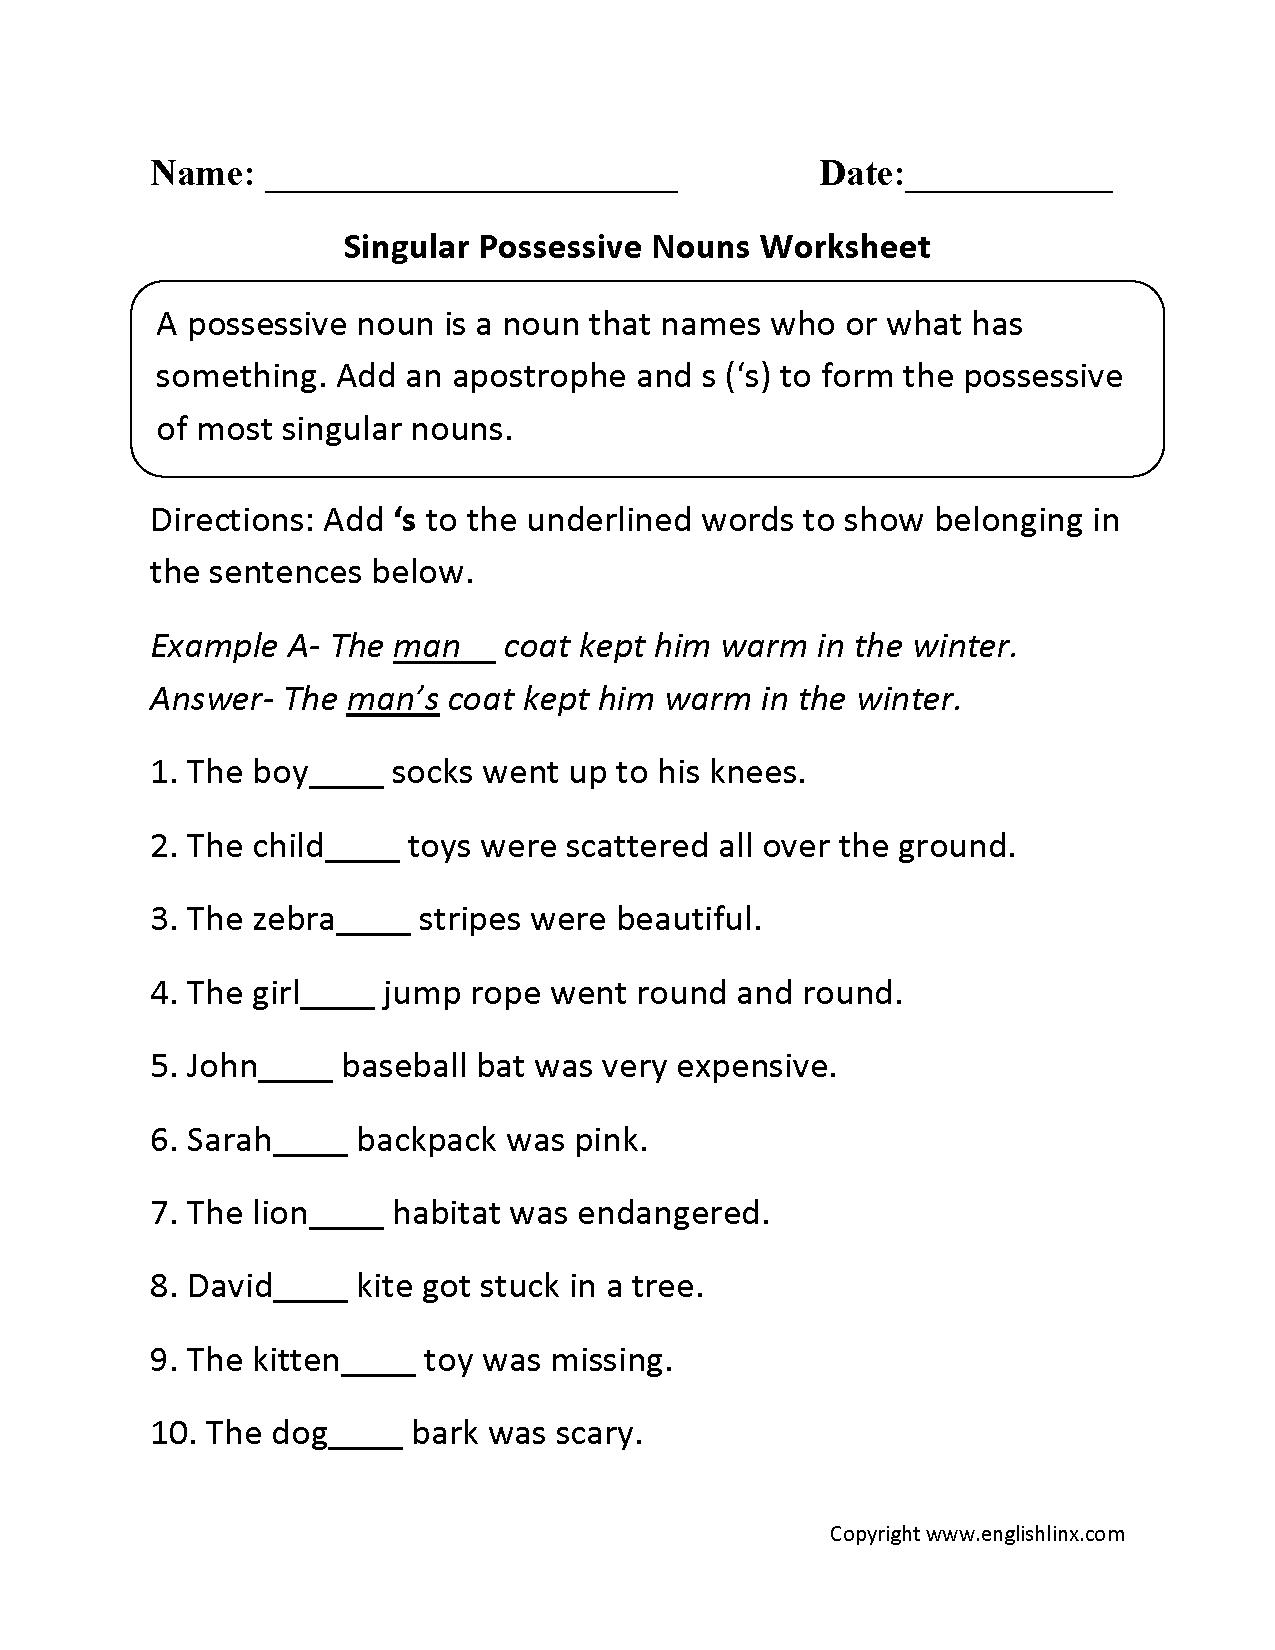 Singular Possessive Nouns Worksheets Language Conventions